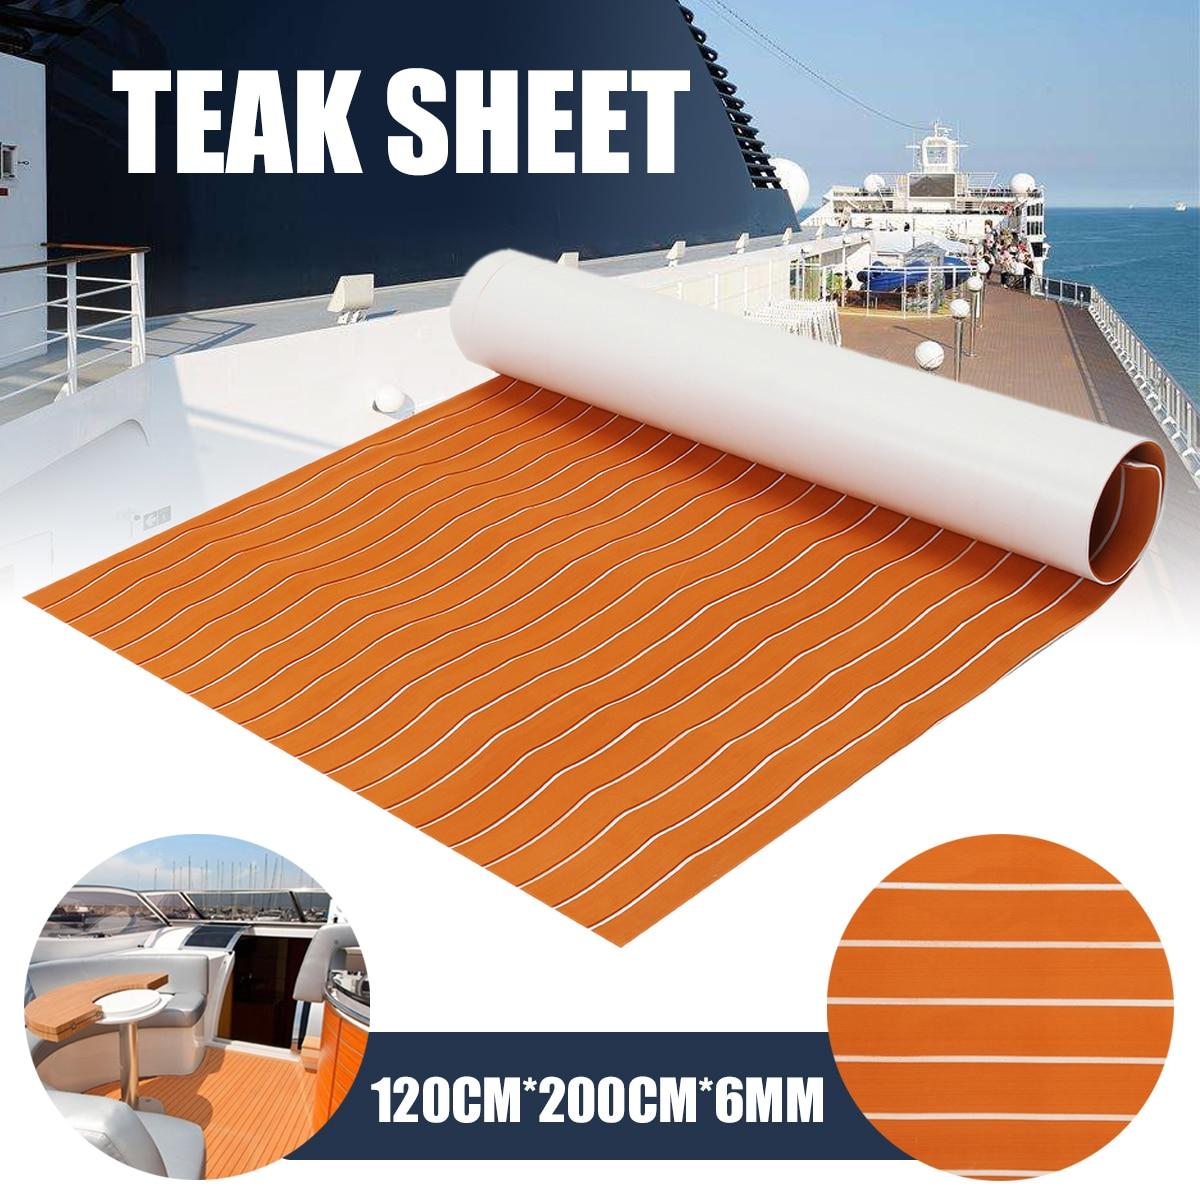 Eva Foam Faux Teak Decking Sheet Dark Brown Marine Boat Thick Diy Car Protective Floor Carpet Marine Boat Yacht Accessories